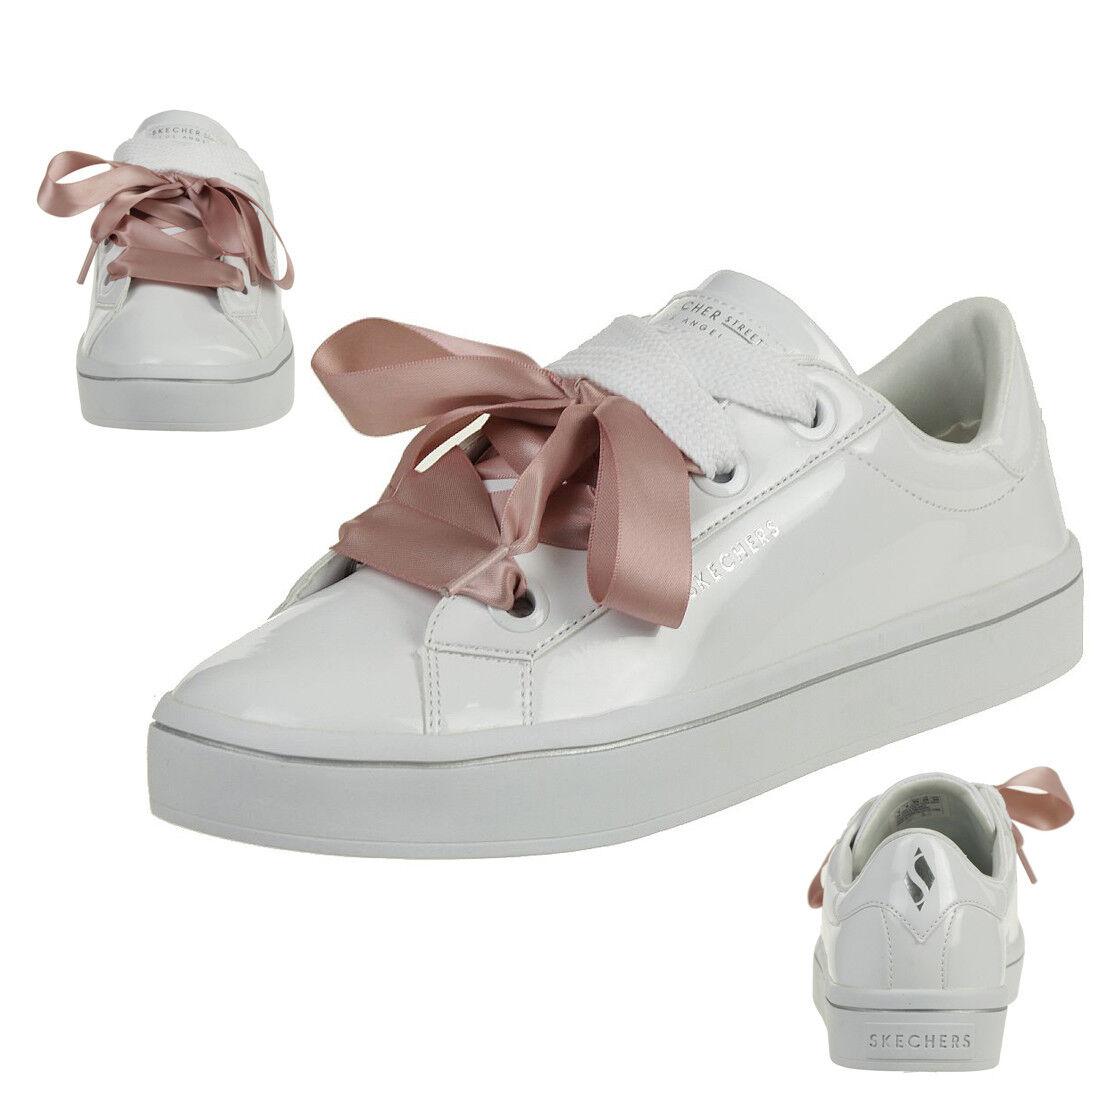 Skechers Hi-lites Slick chaussures baskets Femmes Blanc Verni 959 Wht